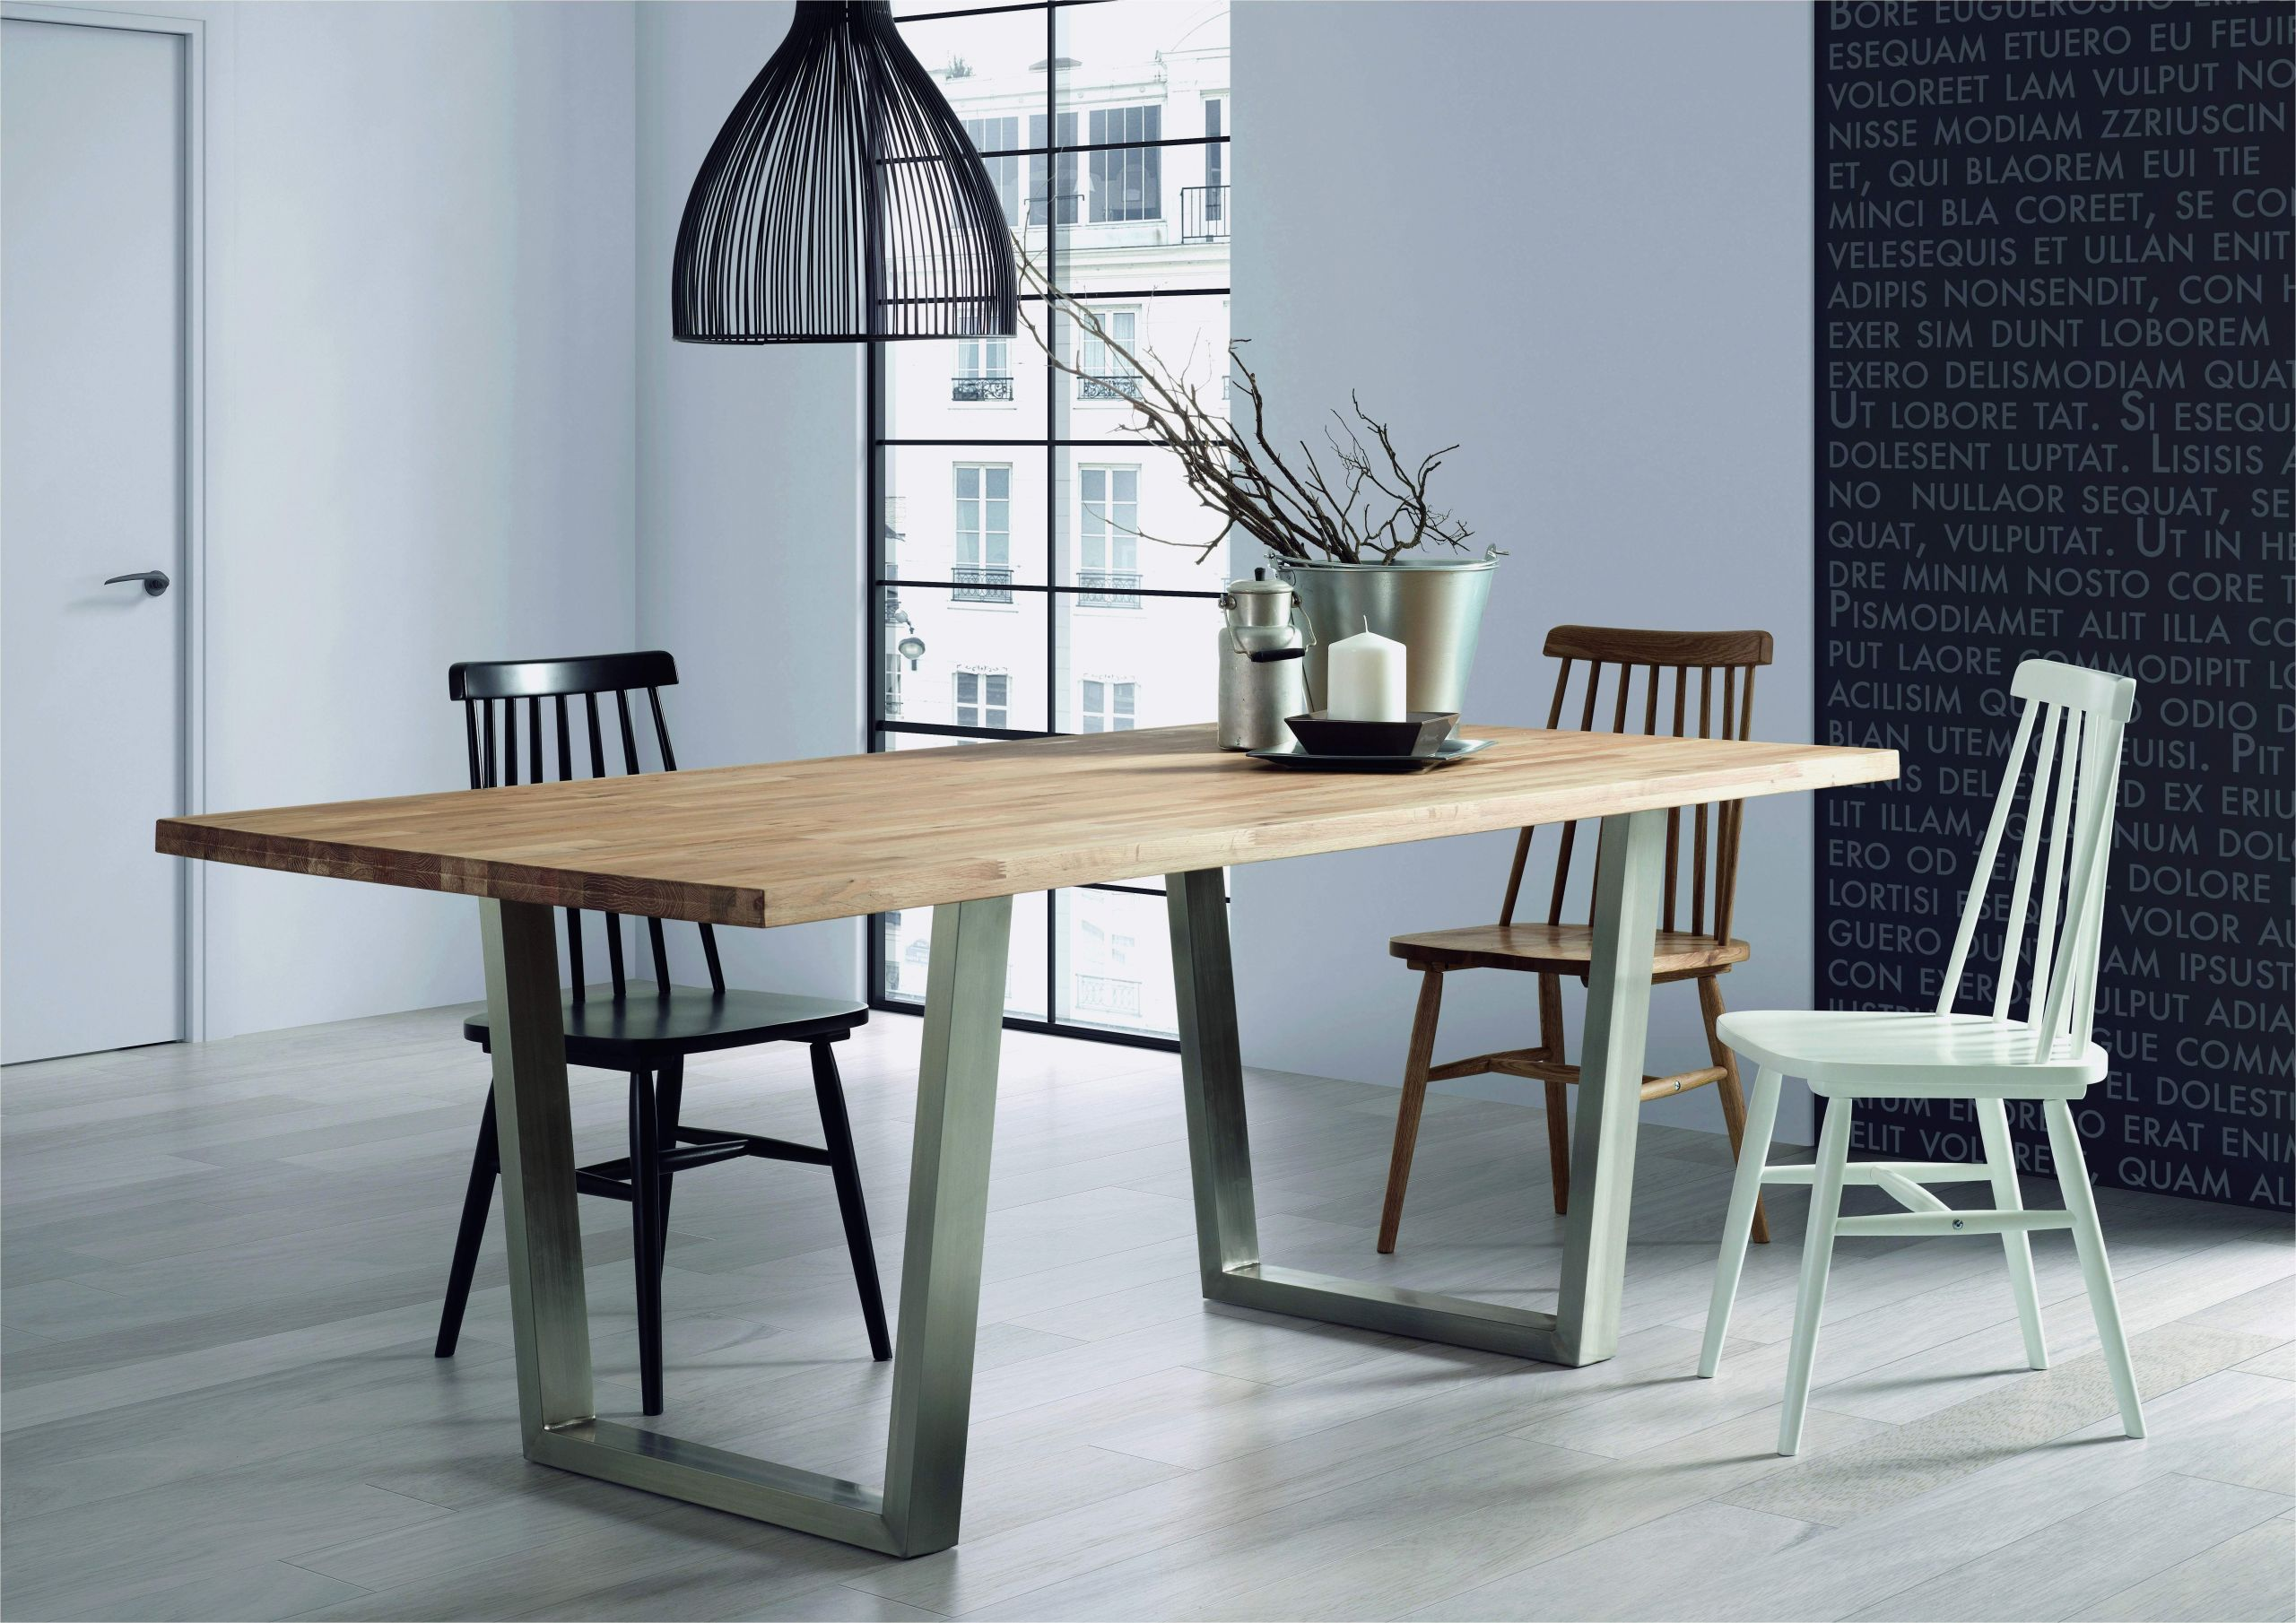 chaise haute ikea bar photo de gracieux ikea chaise haute bar table bar cuisine luxe table et of chaise haute ikea bar